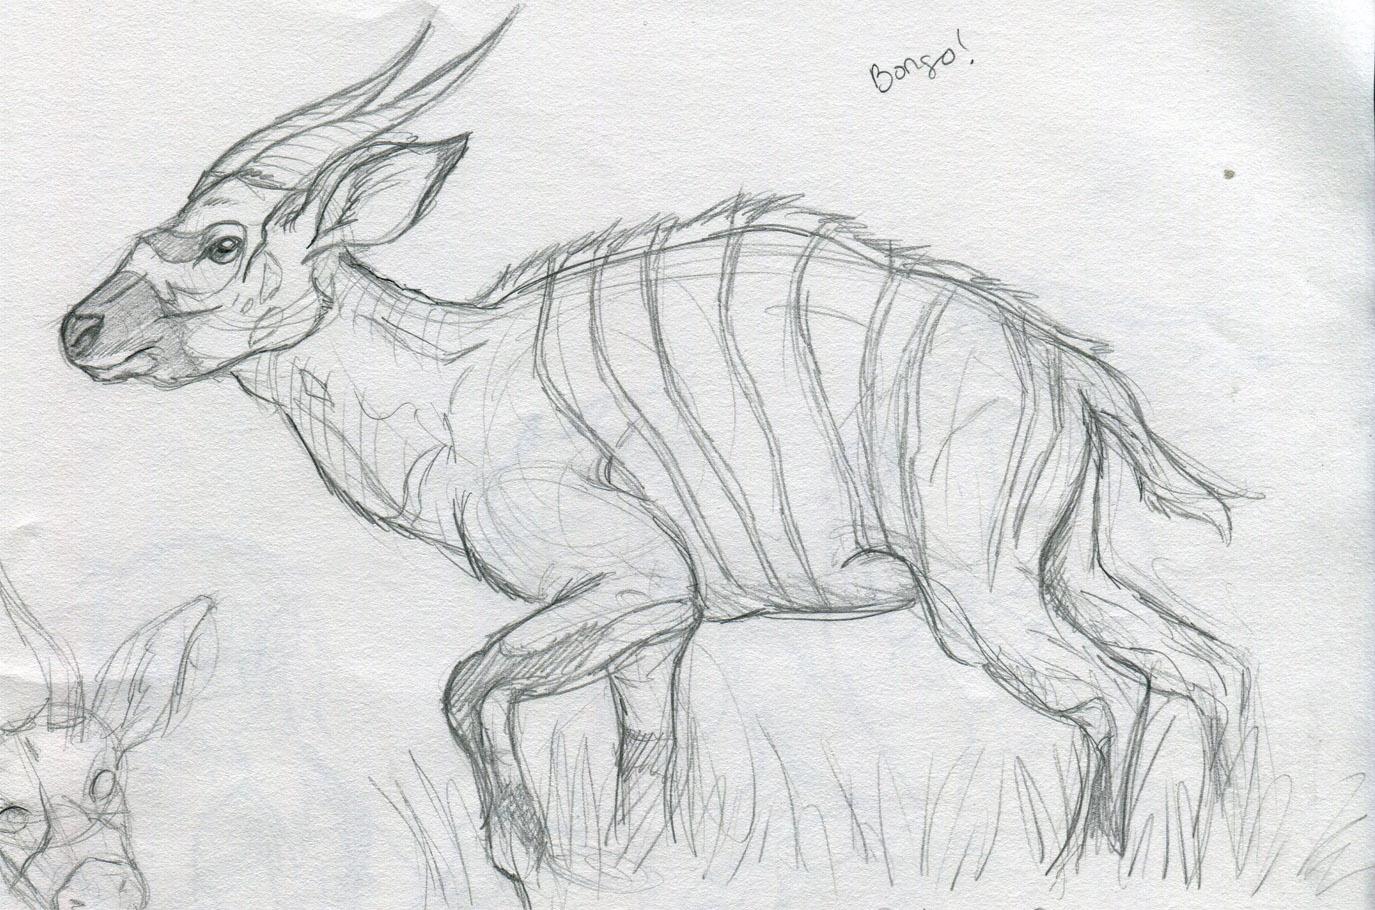 Http Refrigigator Blogspot Com 2010 08 Animal Sketch Bongo Html